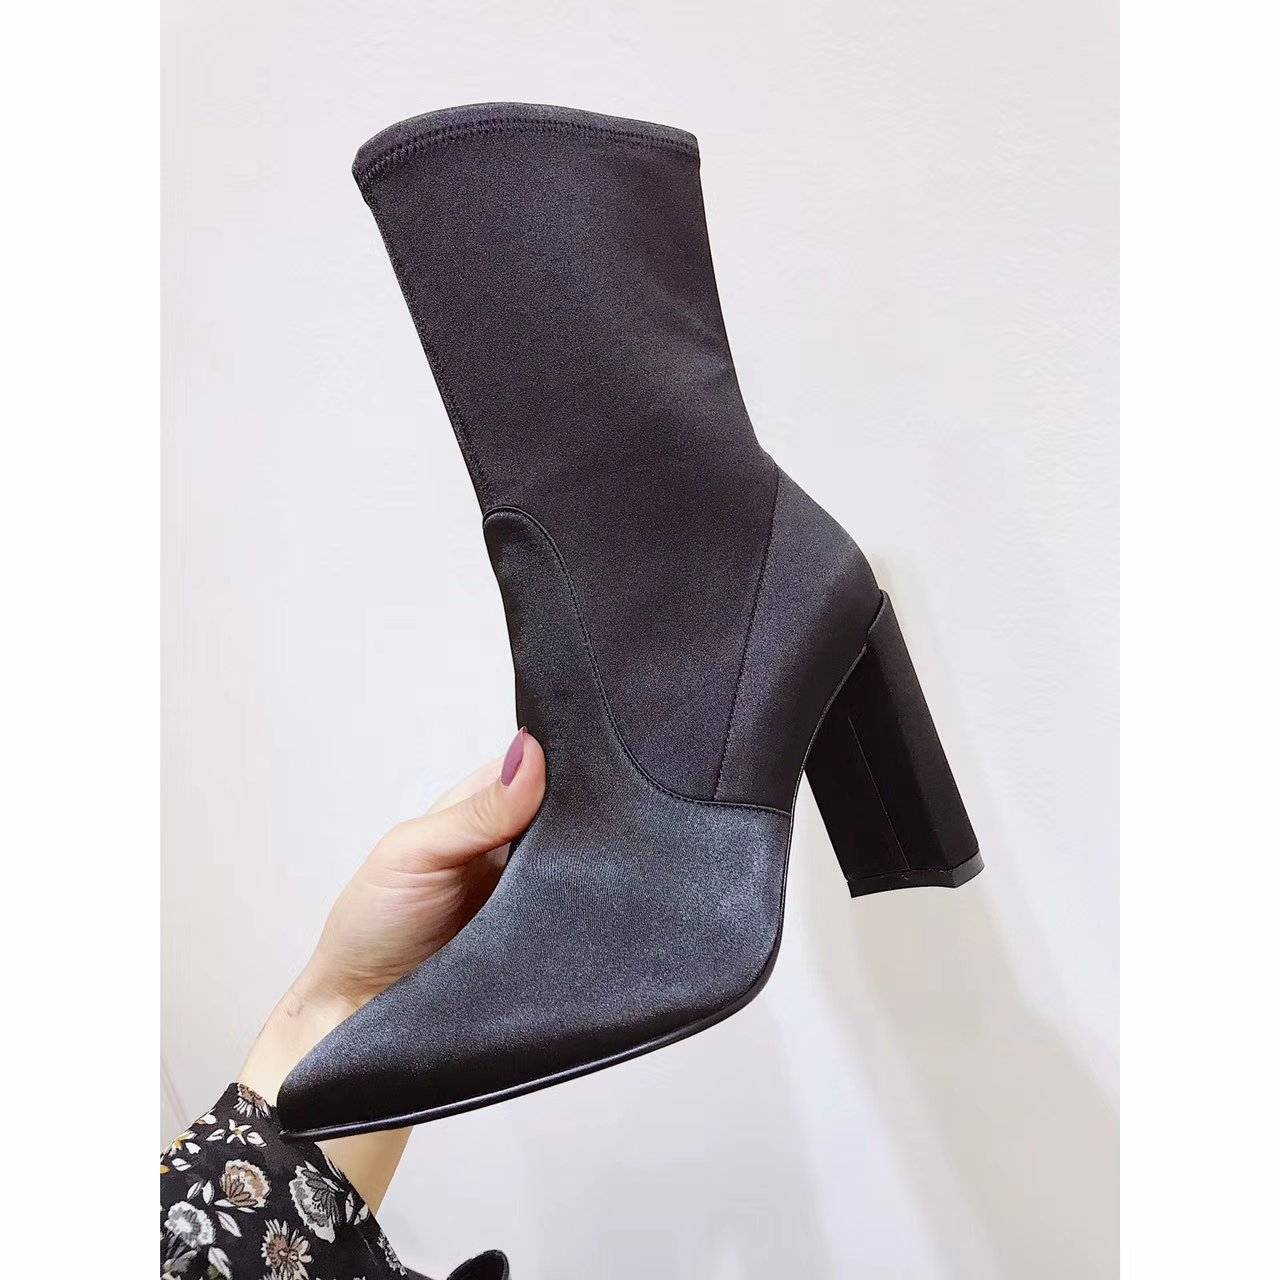 【Stuart Weitzman短靴】17秋冬新品尖头中跟短靴